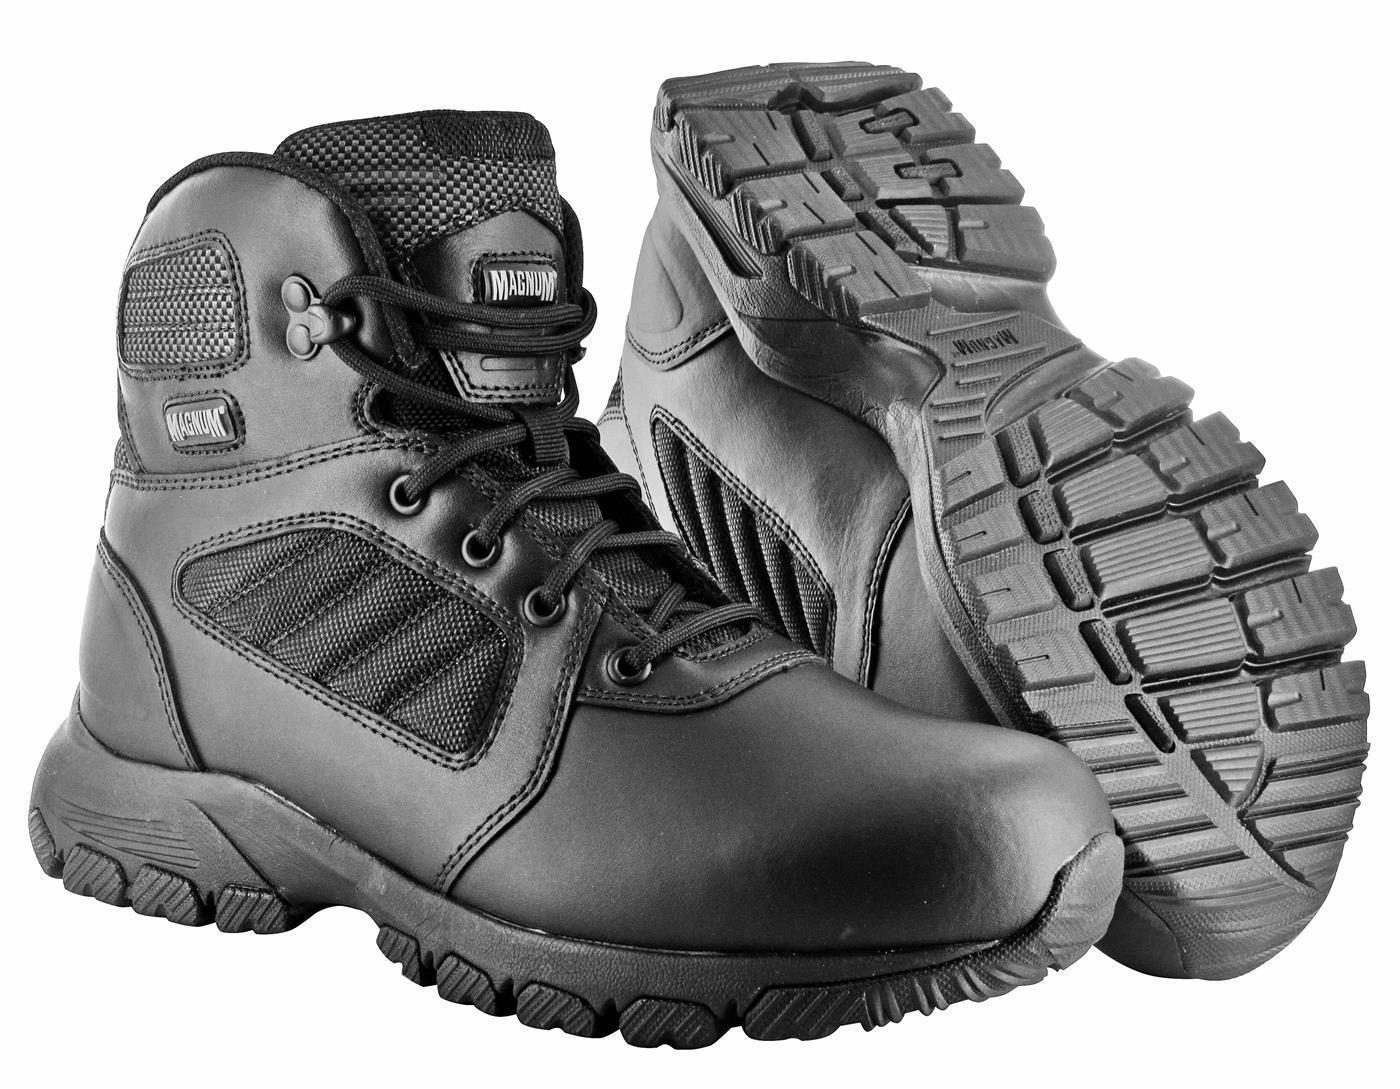 Magnum Magnum Magnum Hi-Tec Cuero Lynx 6.0 Mid Botas Ejército Zapatos seguridad zapatos Hitec 7240f1